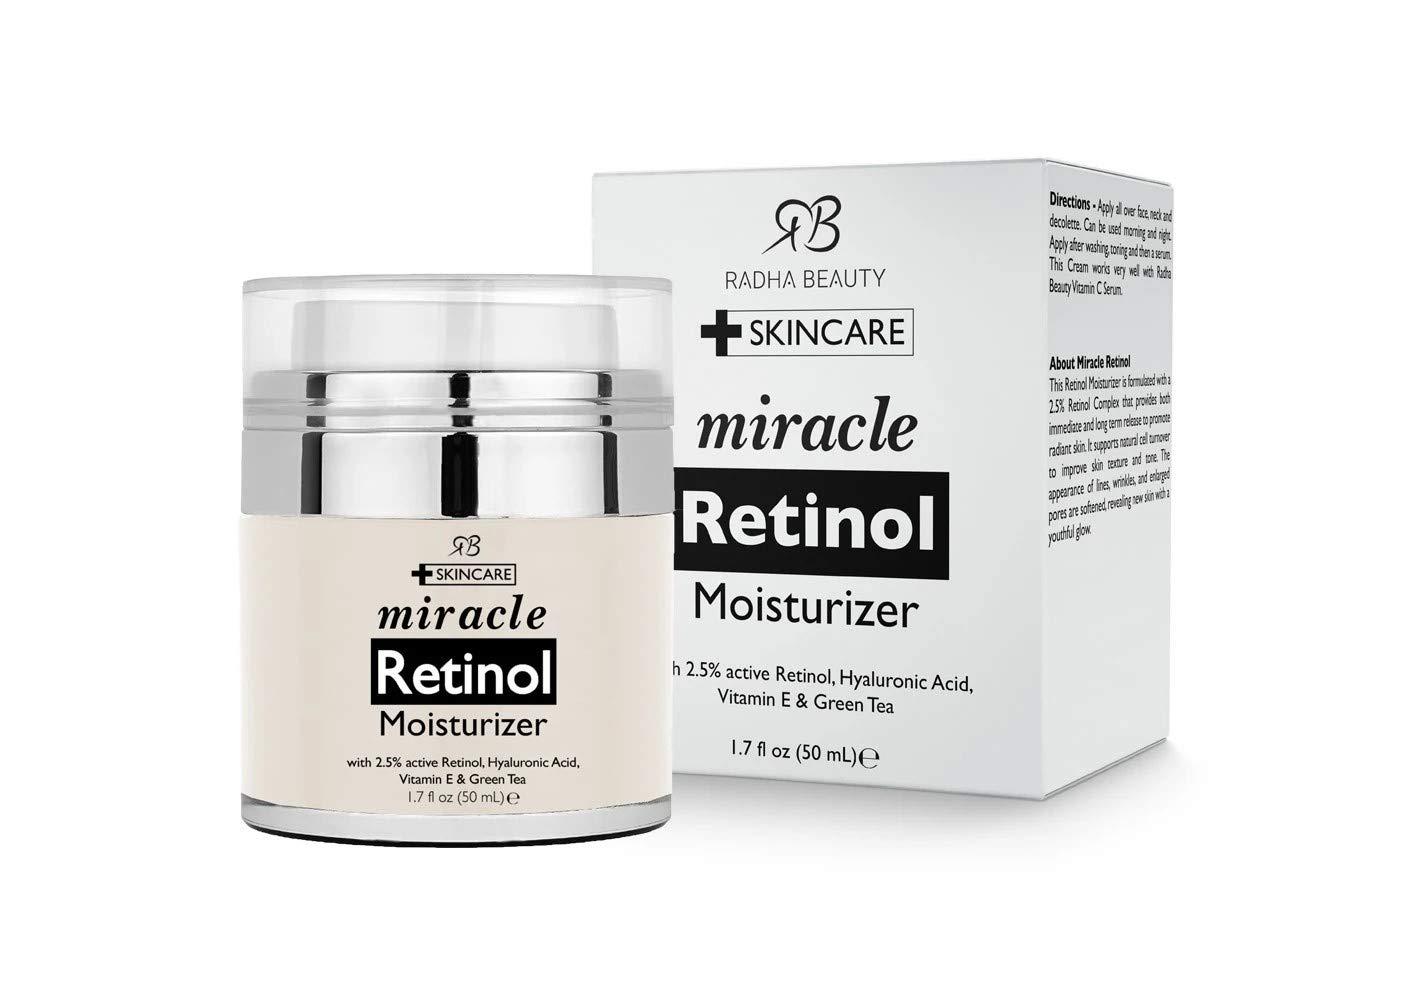 crema facial retinol